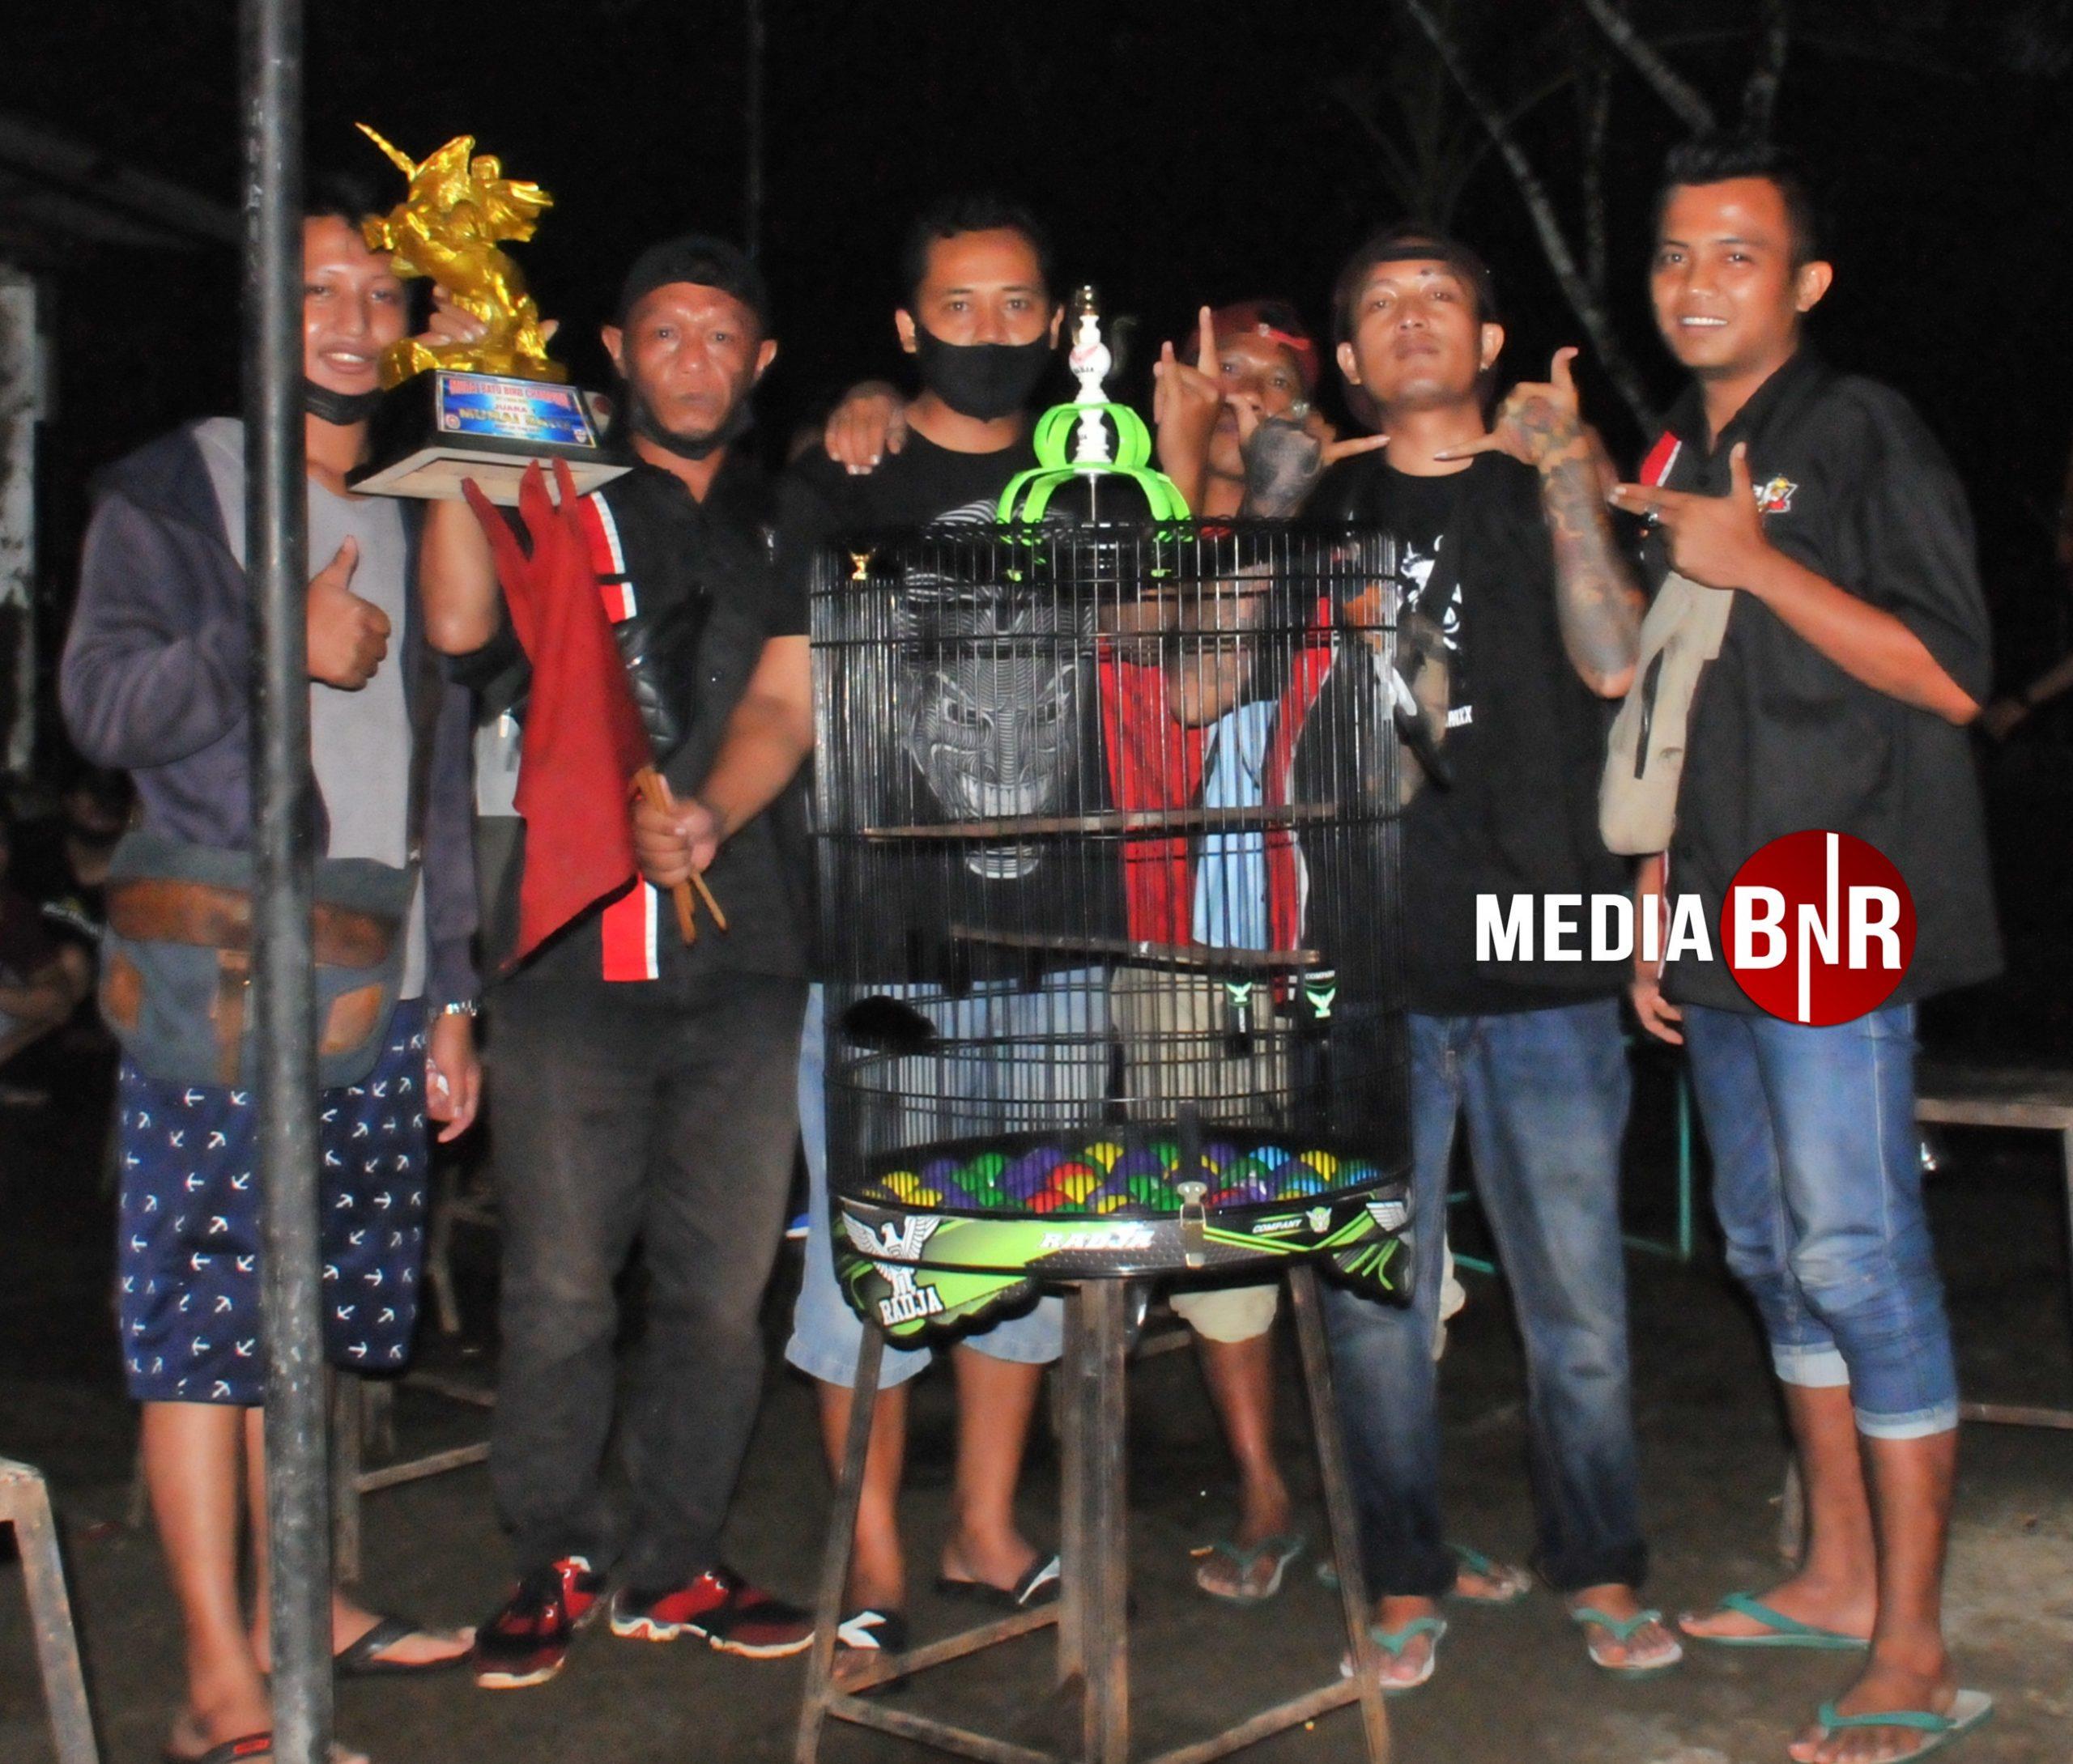 Gito kawal MB Patrum raih Juara 1,2 dan di BOB Juara 1 mendapat predikat murai terbaik